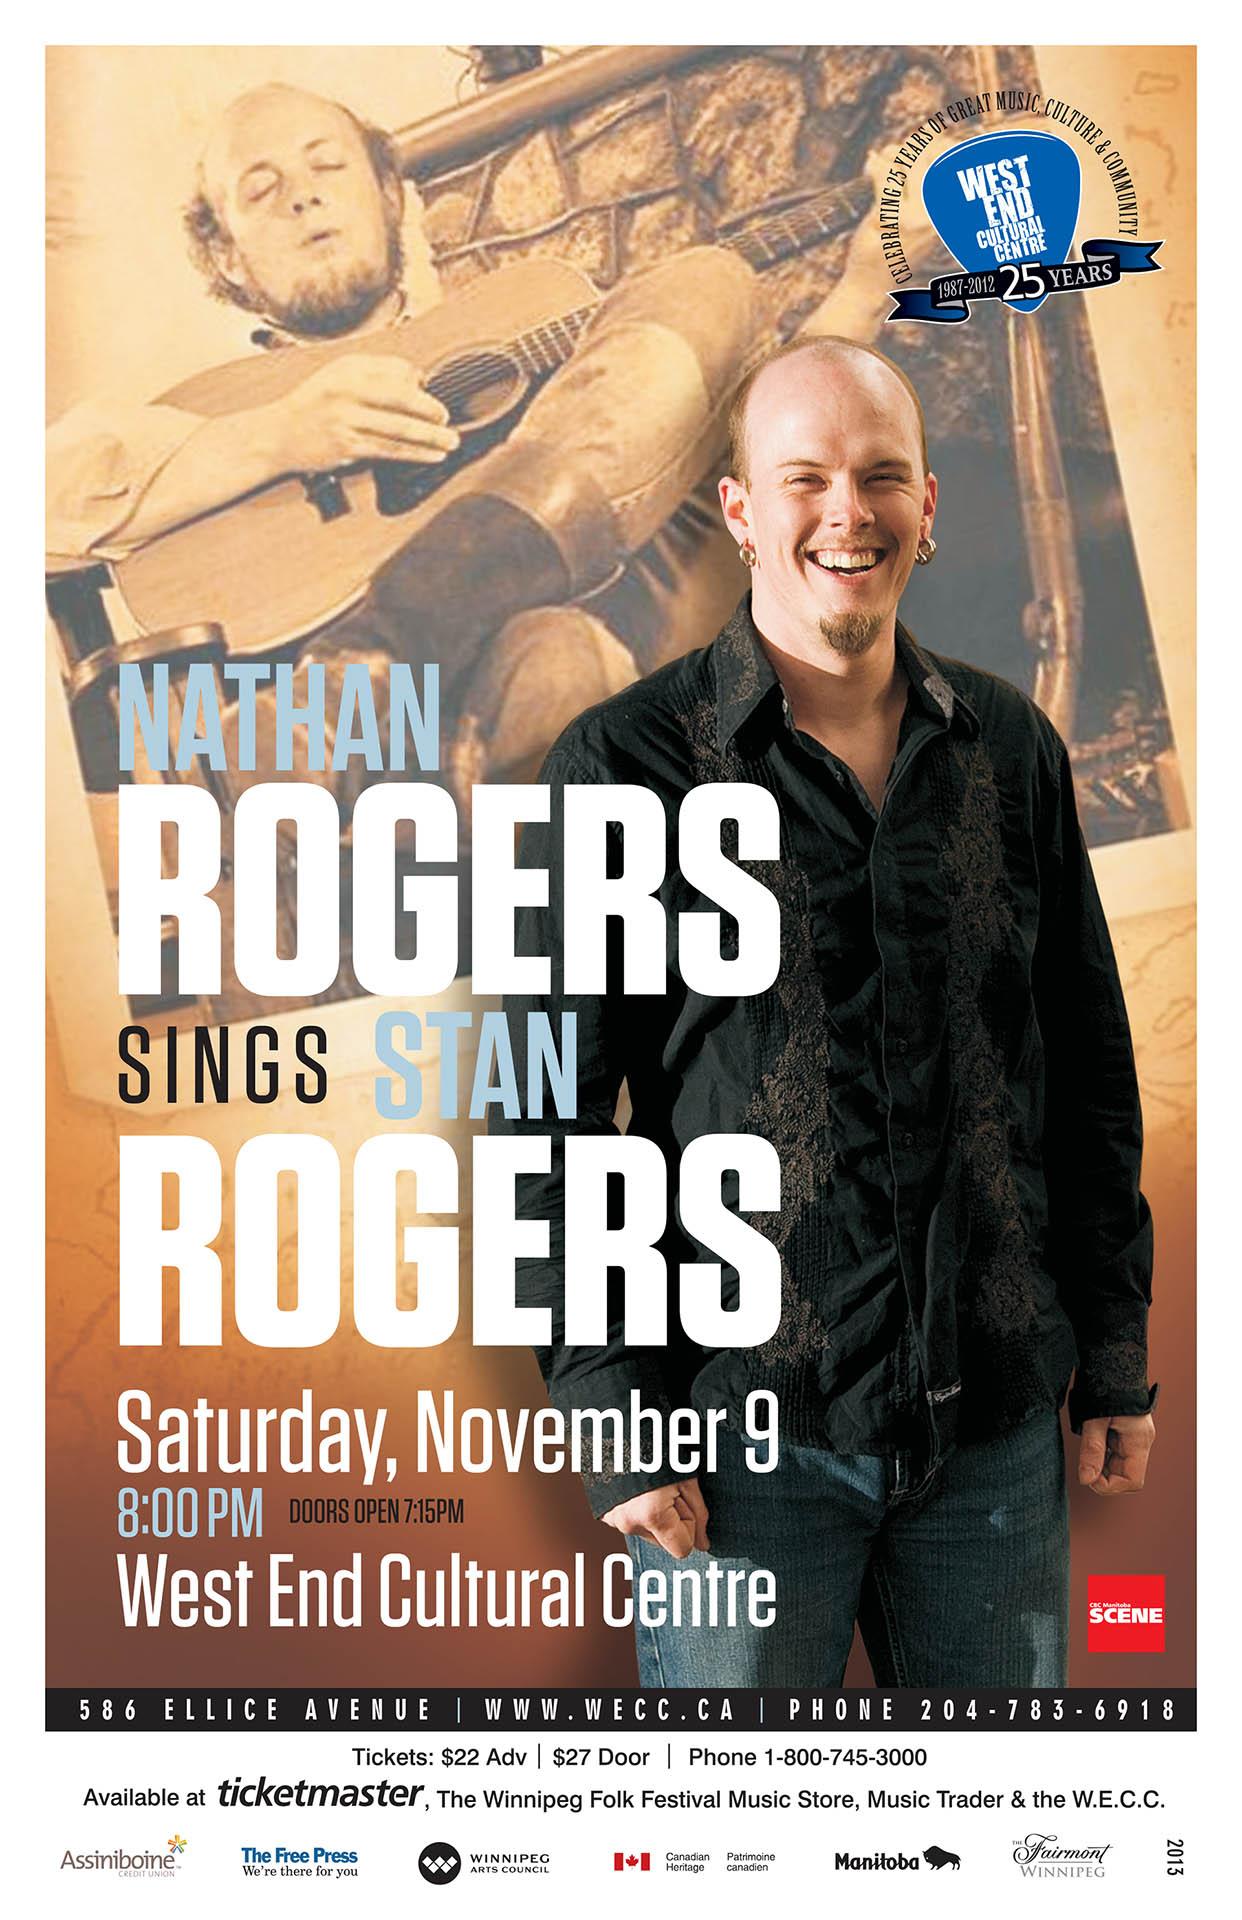 NATHAN ROGERS – 2013